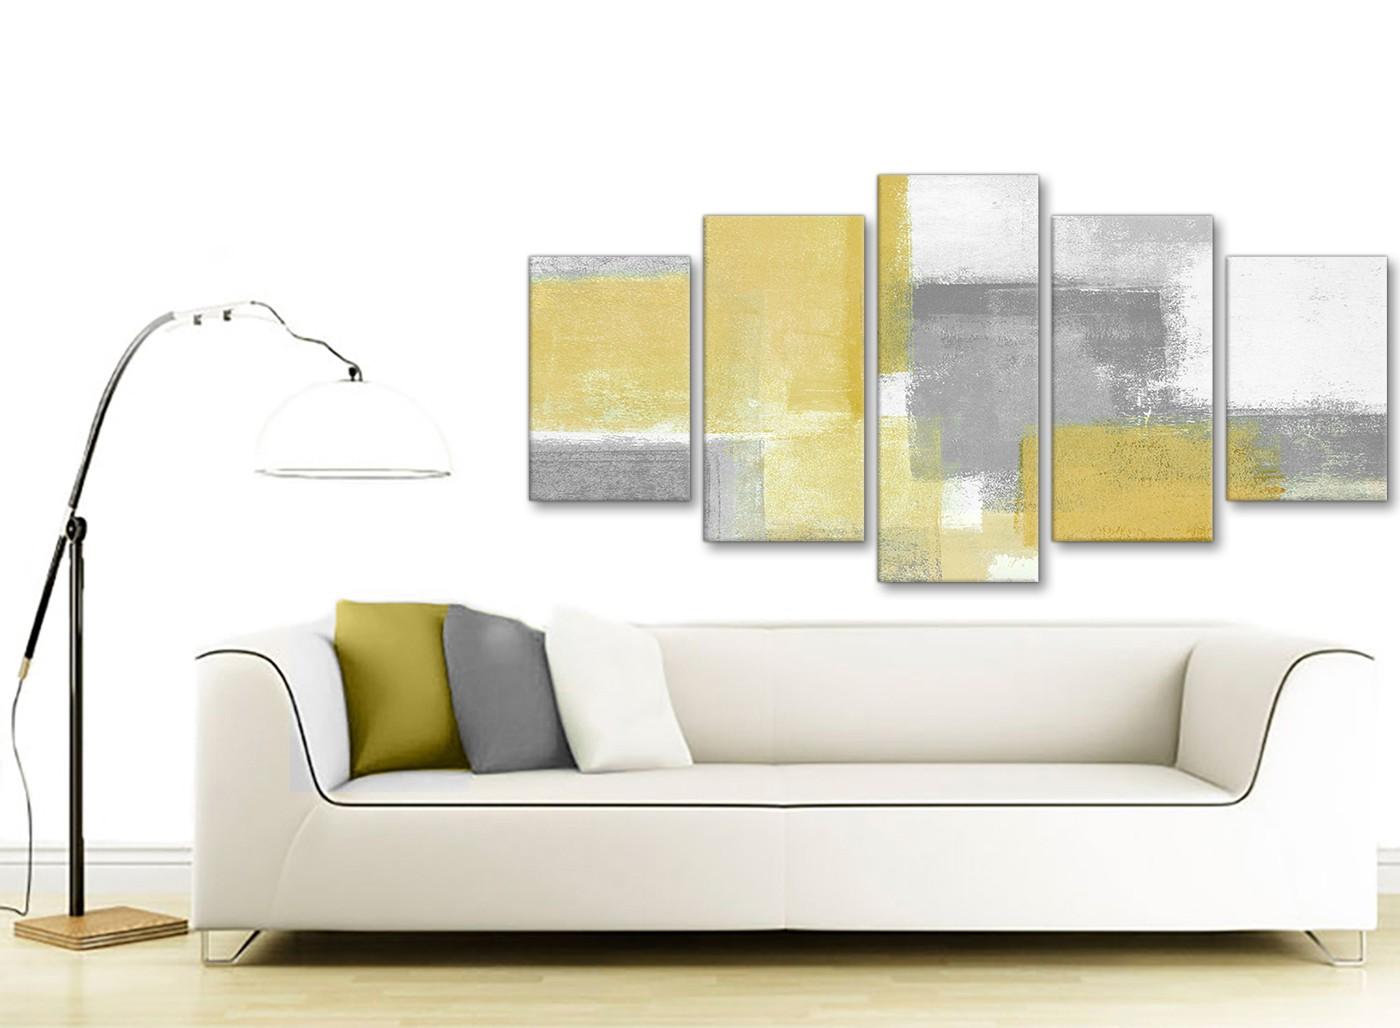 Piece Mustard Yellow Grey Abstract Living Room Canvas Wall Art Decor Set Artwork